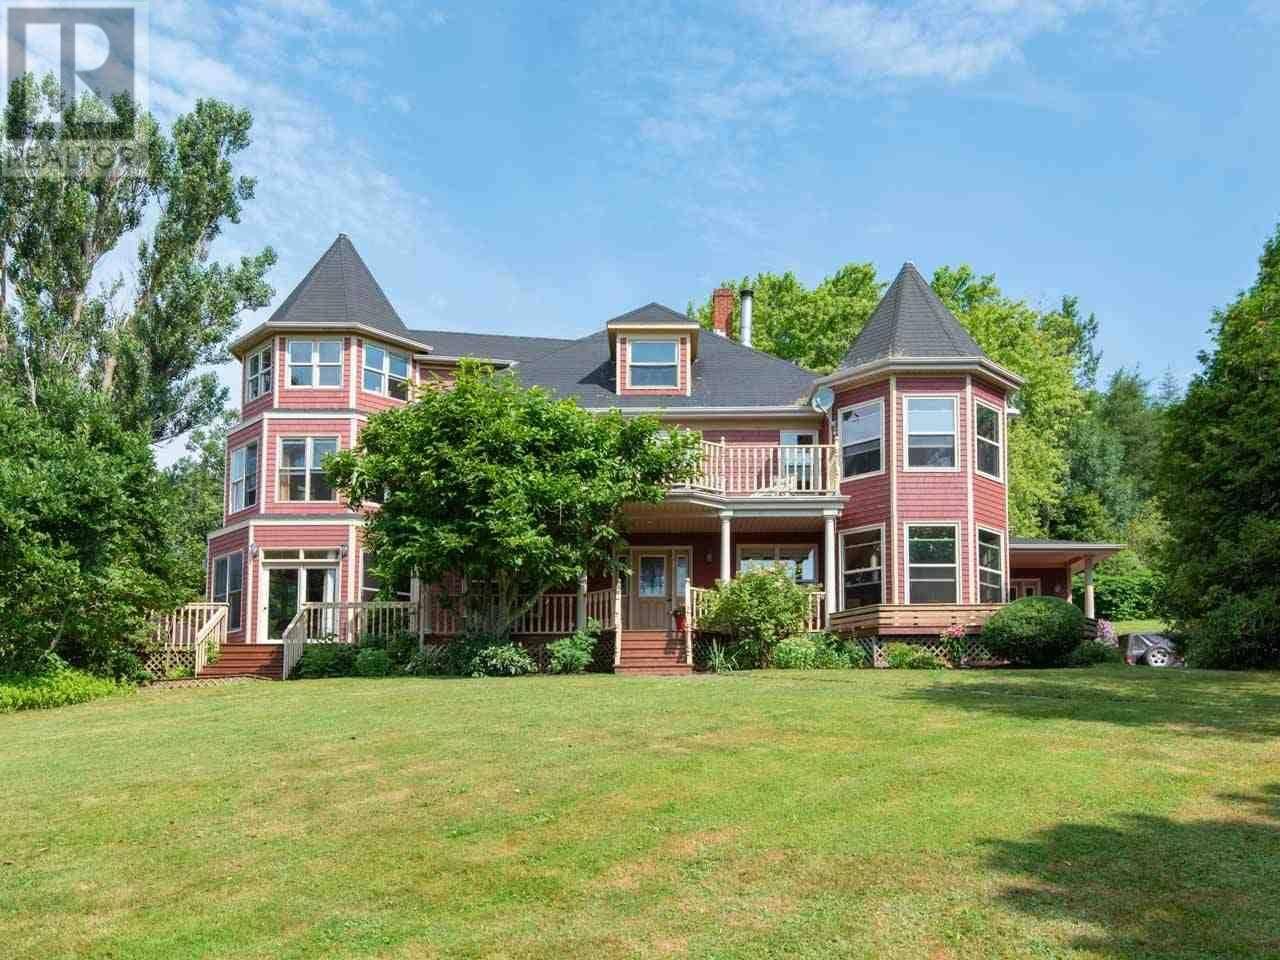 House for sale at 414 Pownal Road Rte Pownal Prince Edward Island - MLS: 201819670